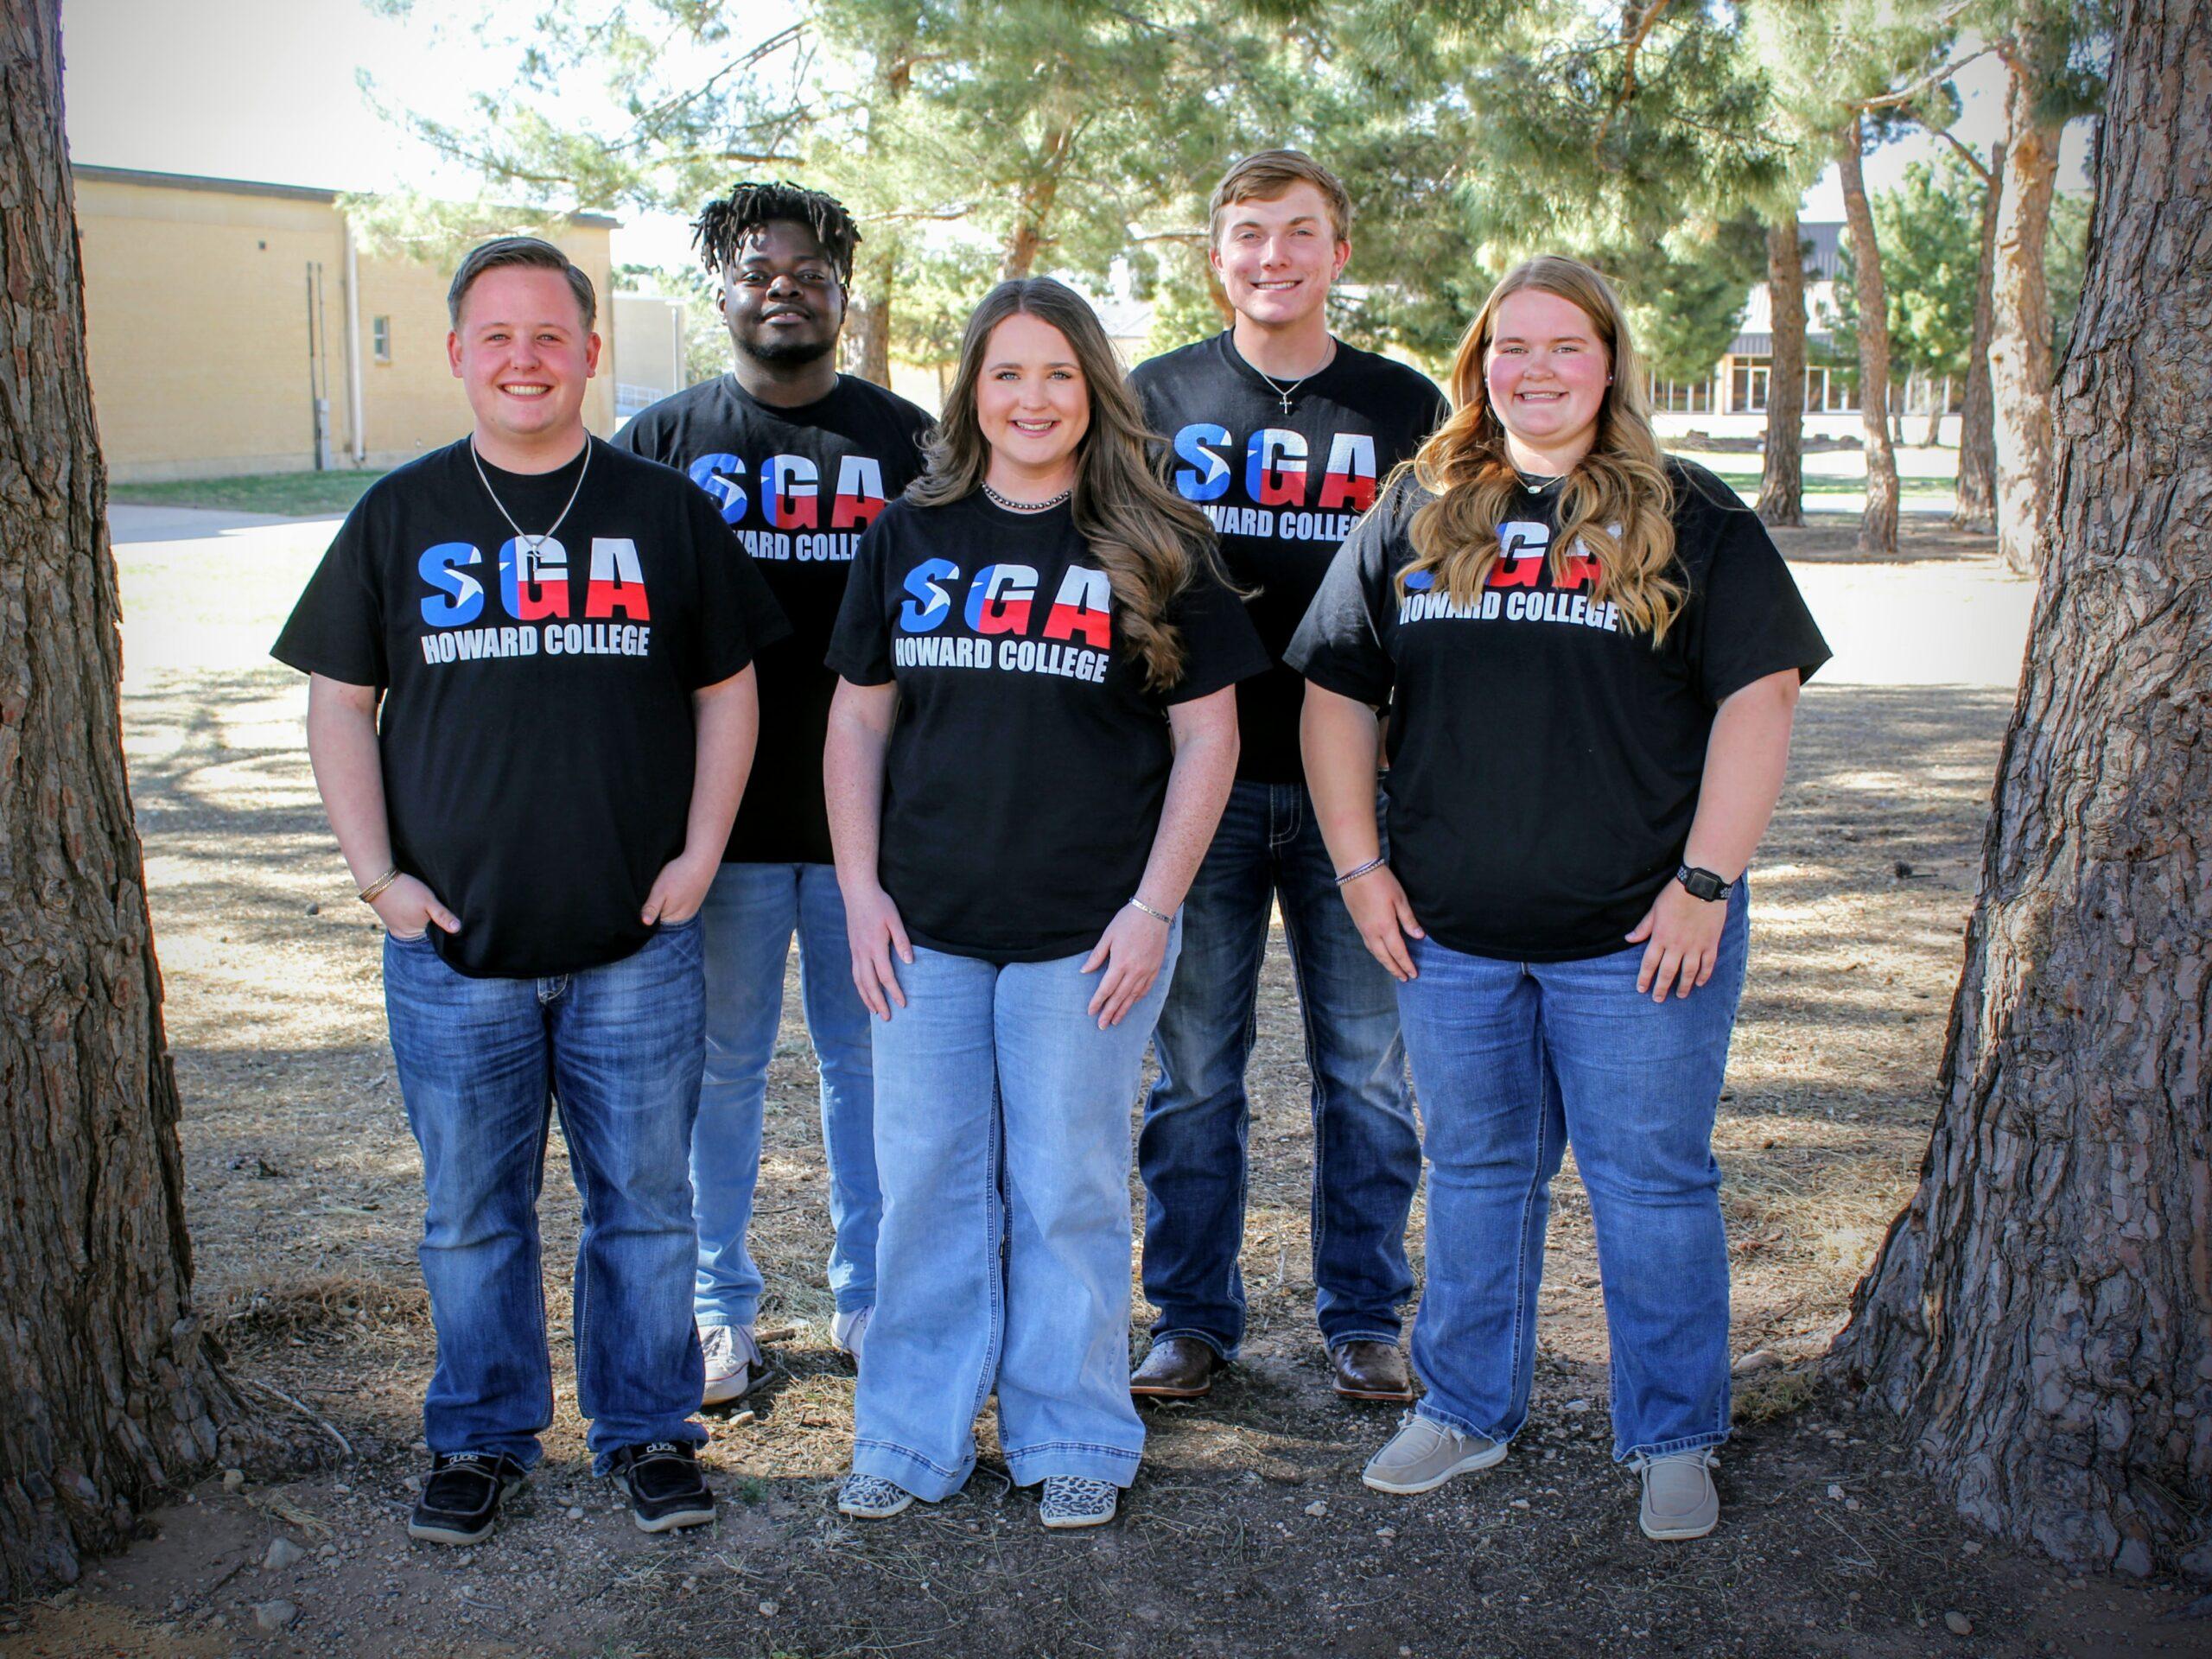 Big Spring SGA Students